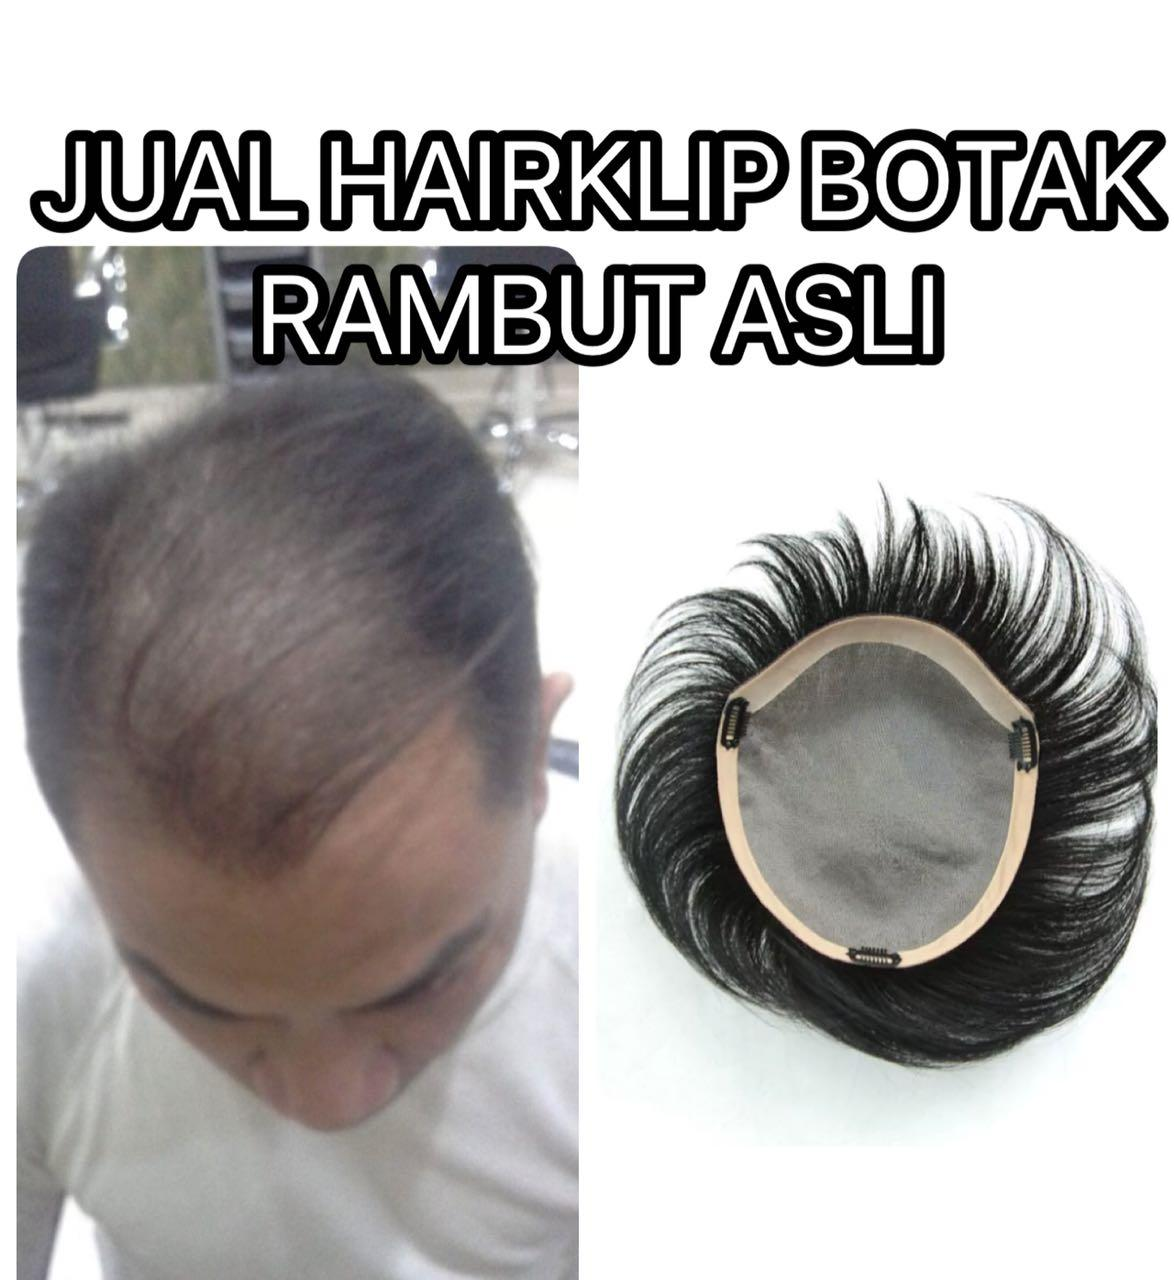 Hairclip - Hairklip - Penutup kebotakan - Human hair asli - Rambut asli - Real hair